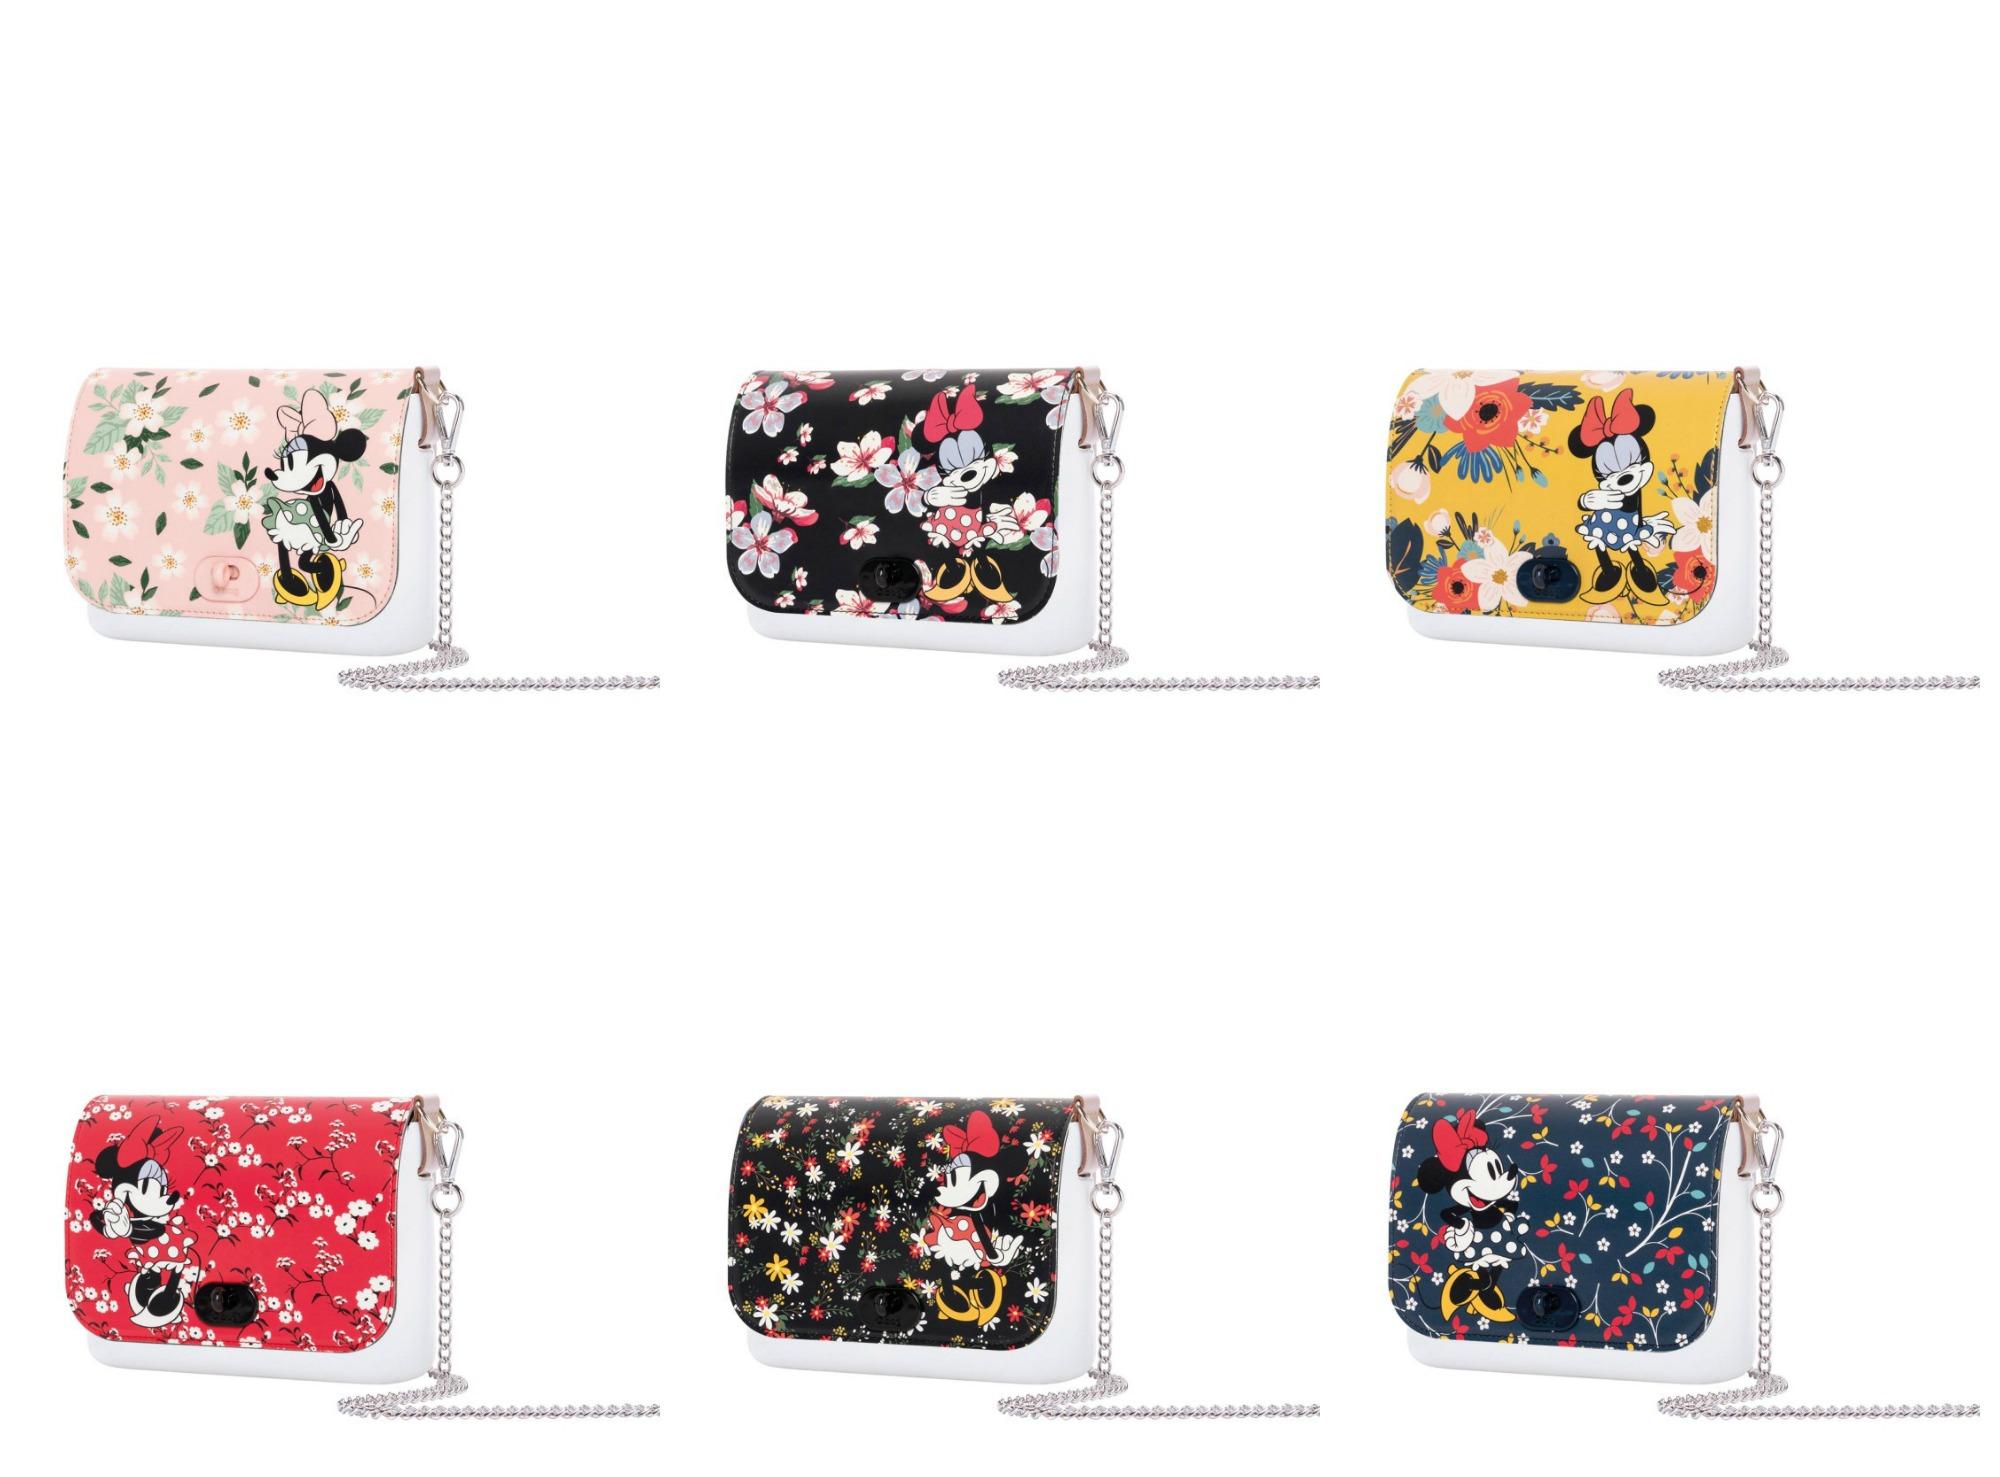 Nuove Pattine O Pocket Minnie Disney Nuove Pattine O Pocket Minnie Disney - Nuove Borse O Pocket Disney di O Bag Nuove Pattine O Pocket Minnie Disney - Nuove Borse O Pocket Disney di O Bag